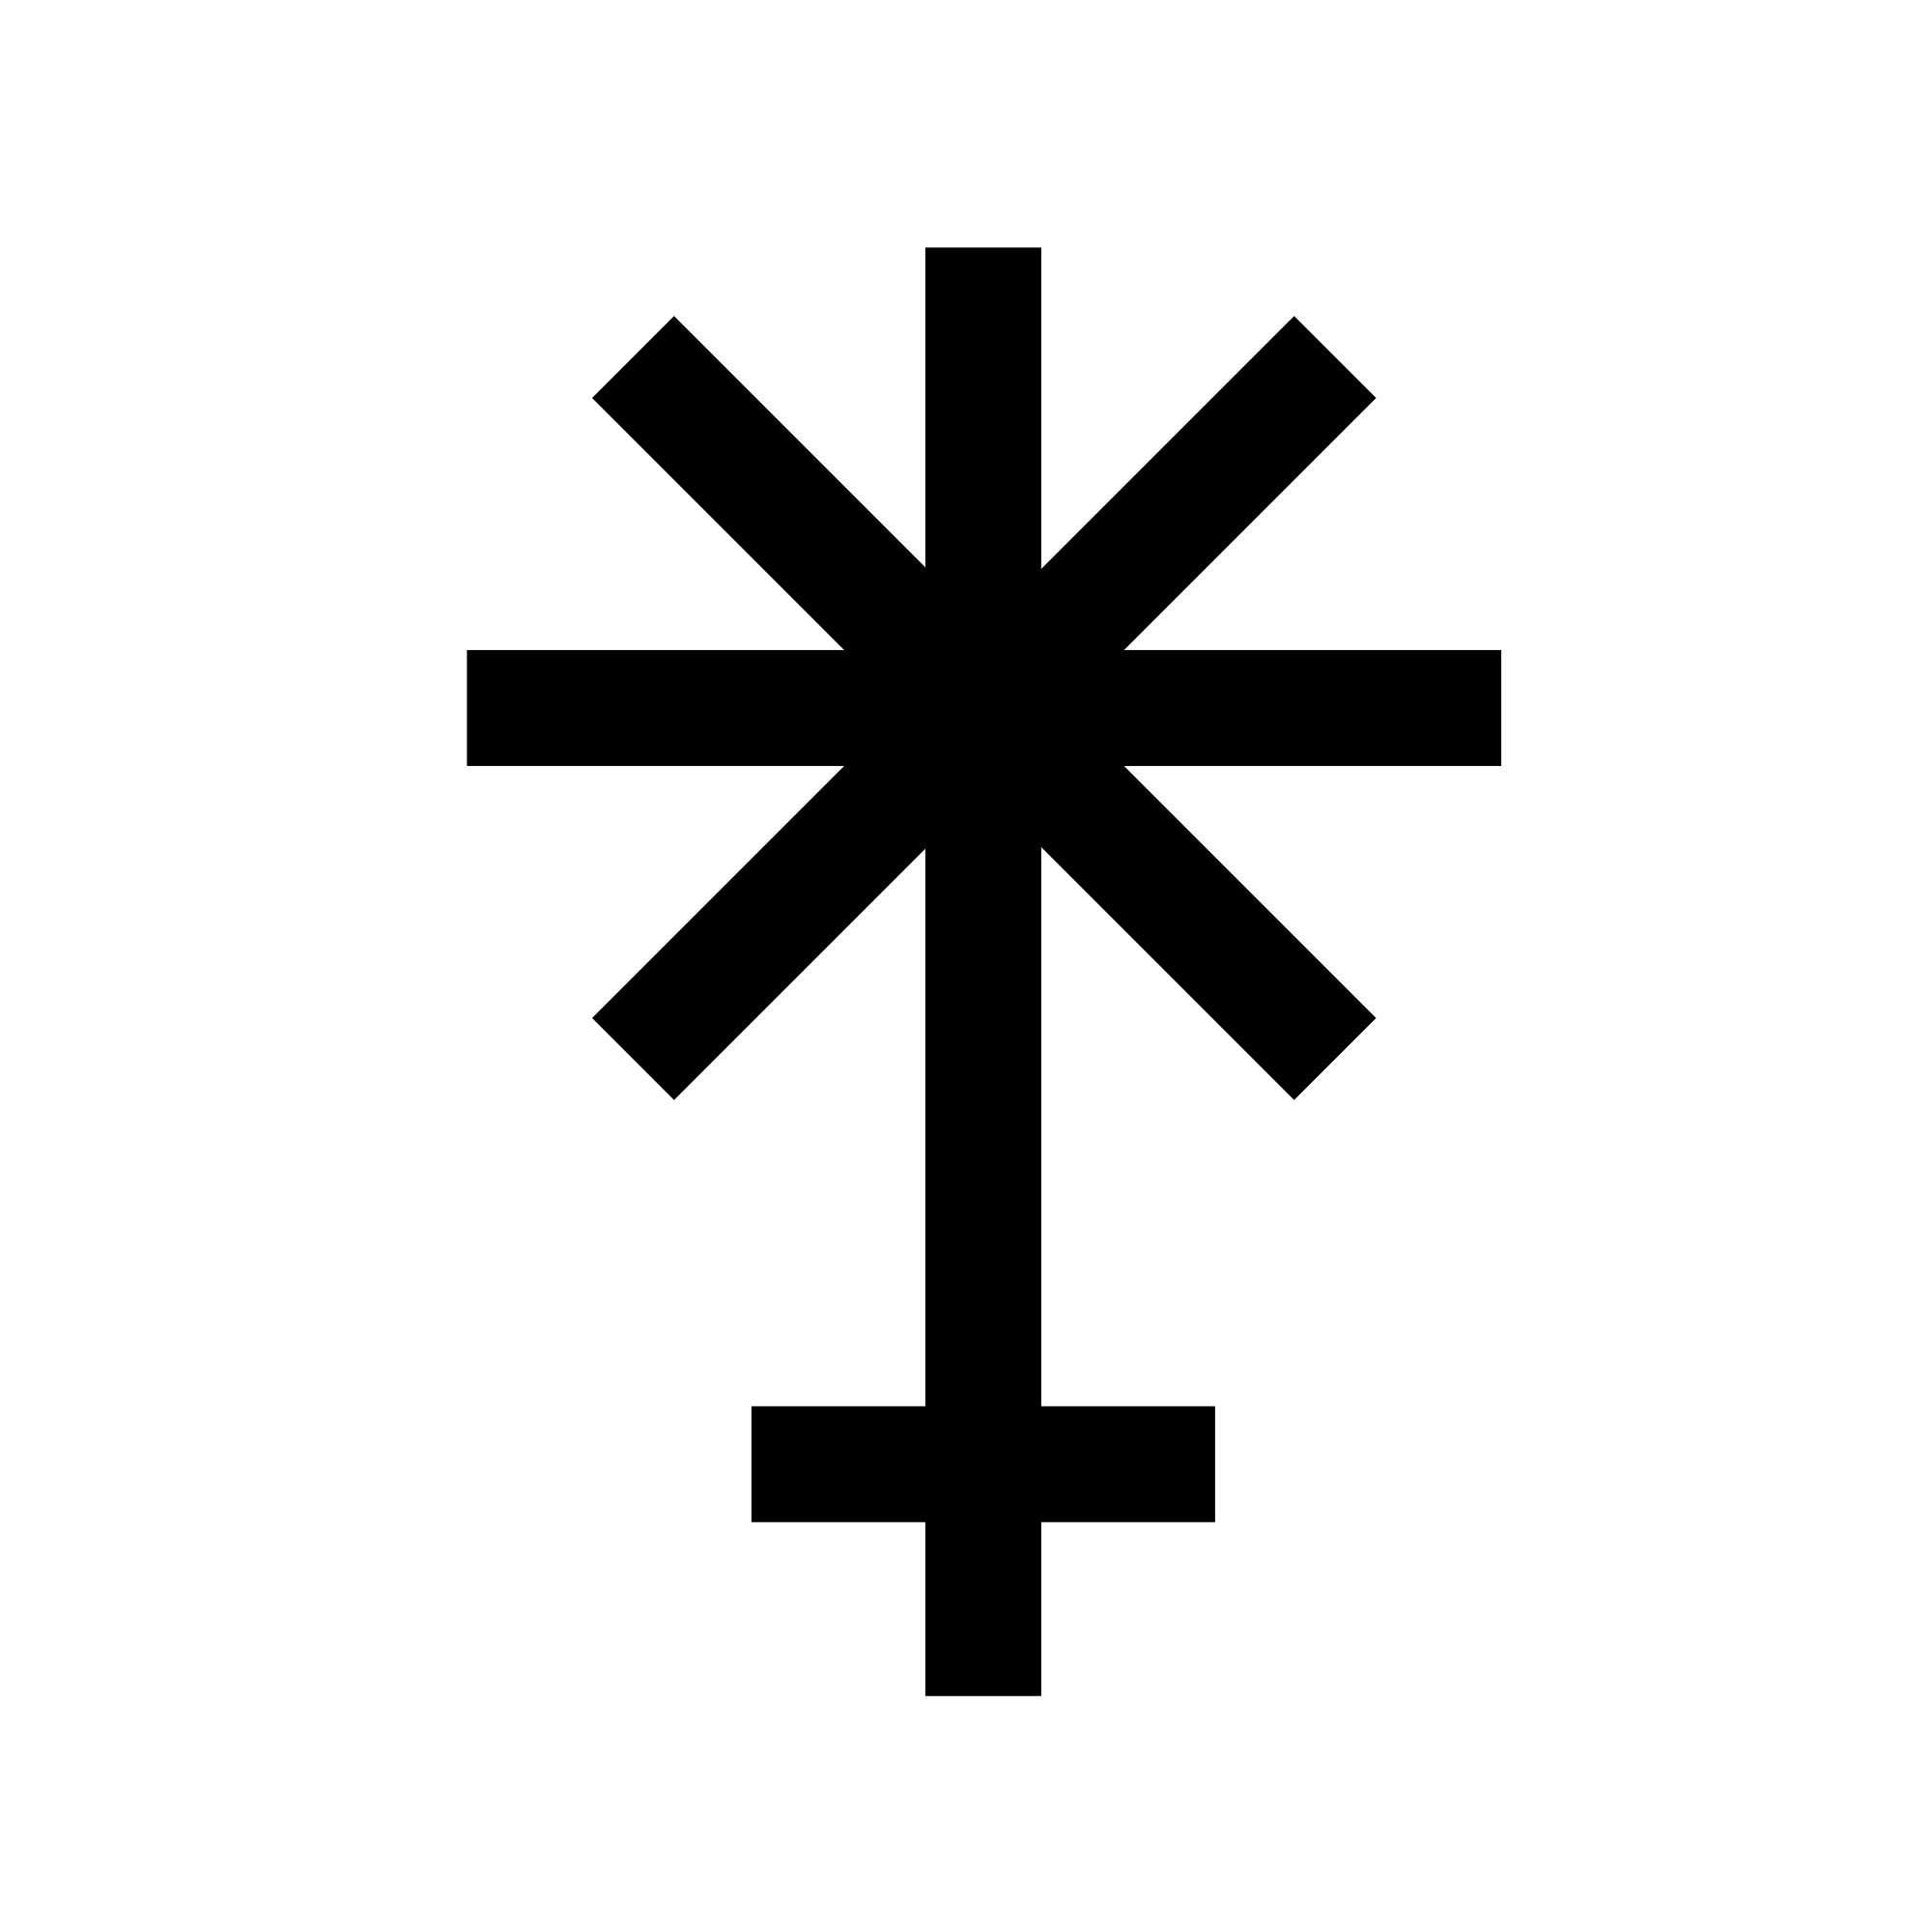 Symbols glossarium credo quia absurdum juno biocorpaavc Choice Image